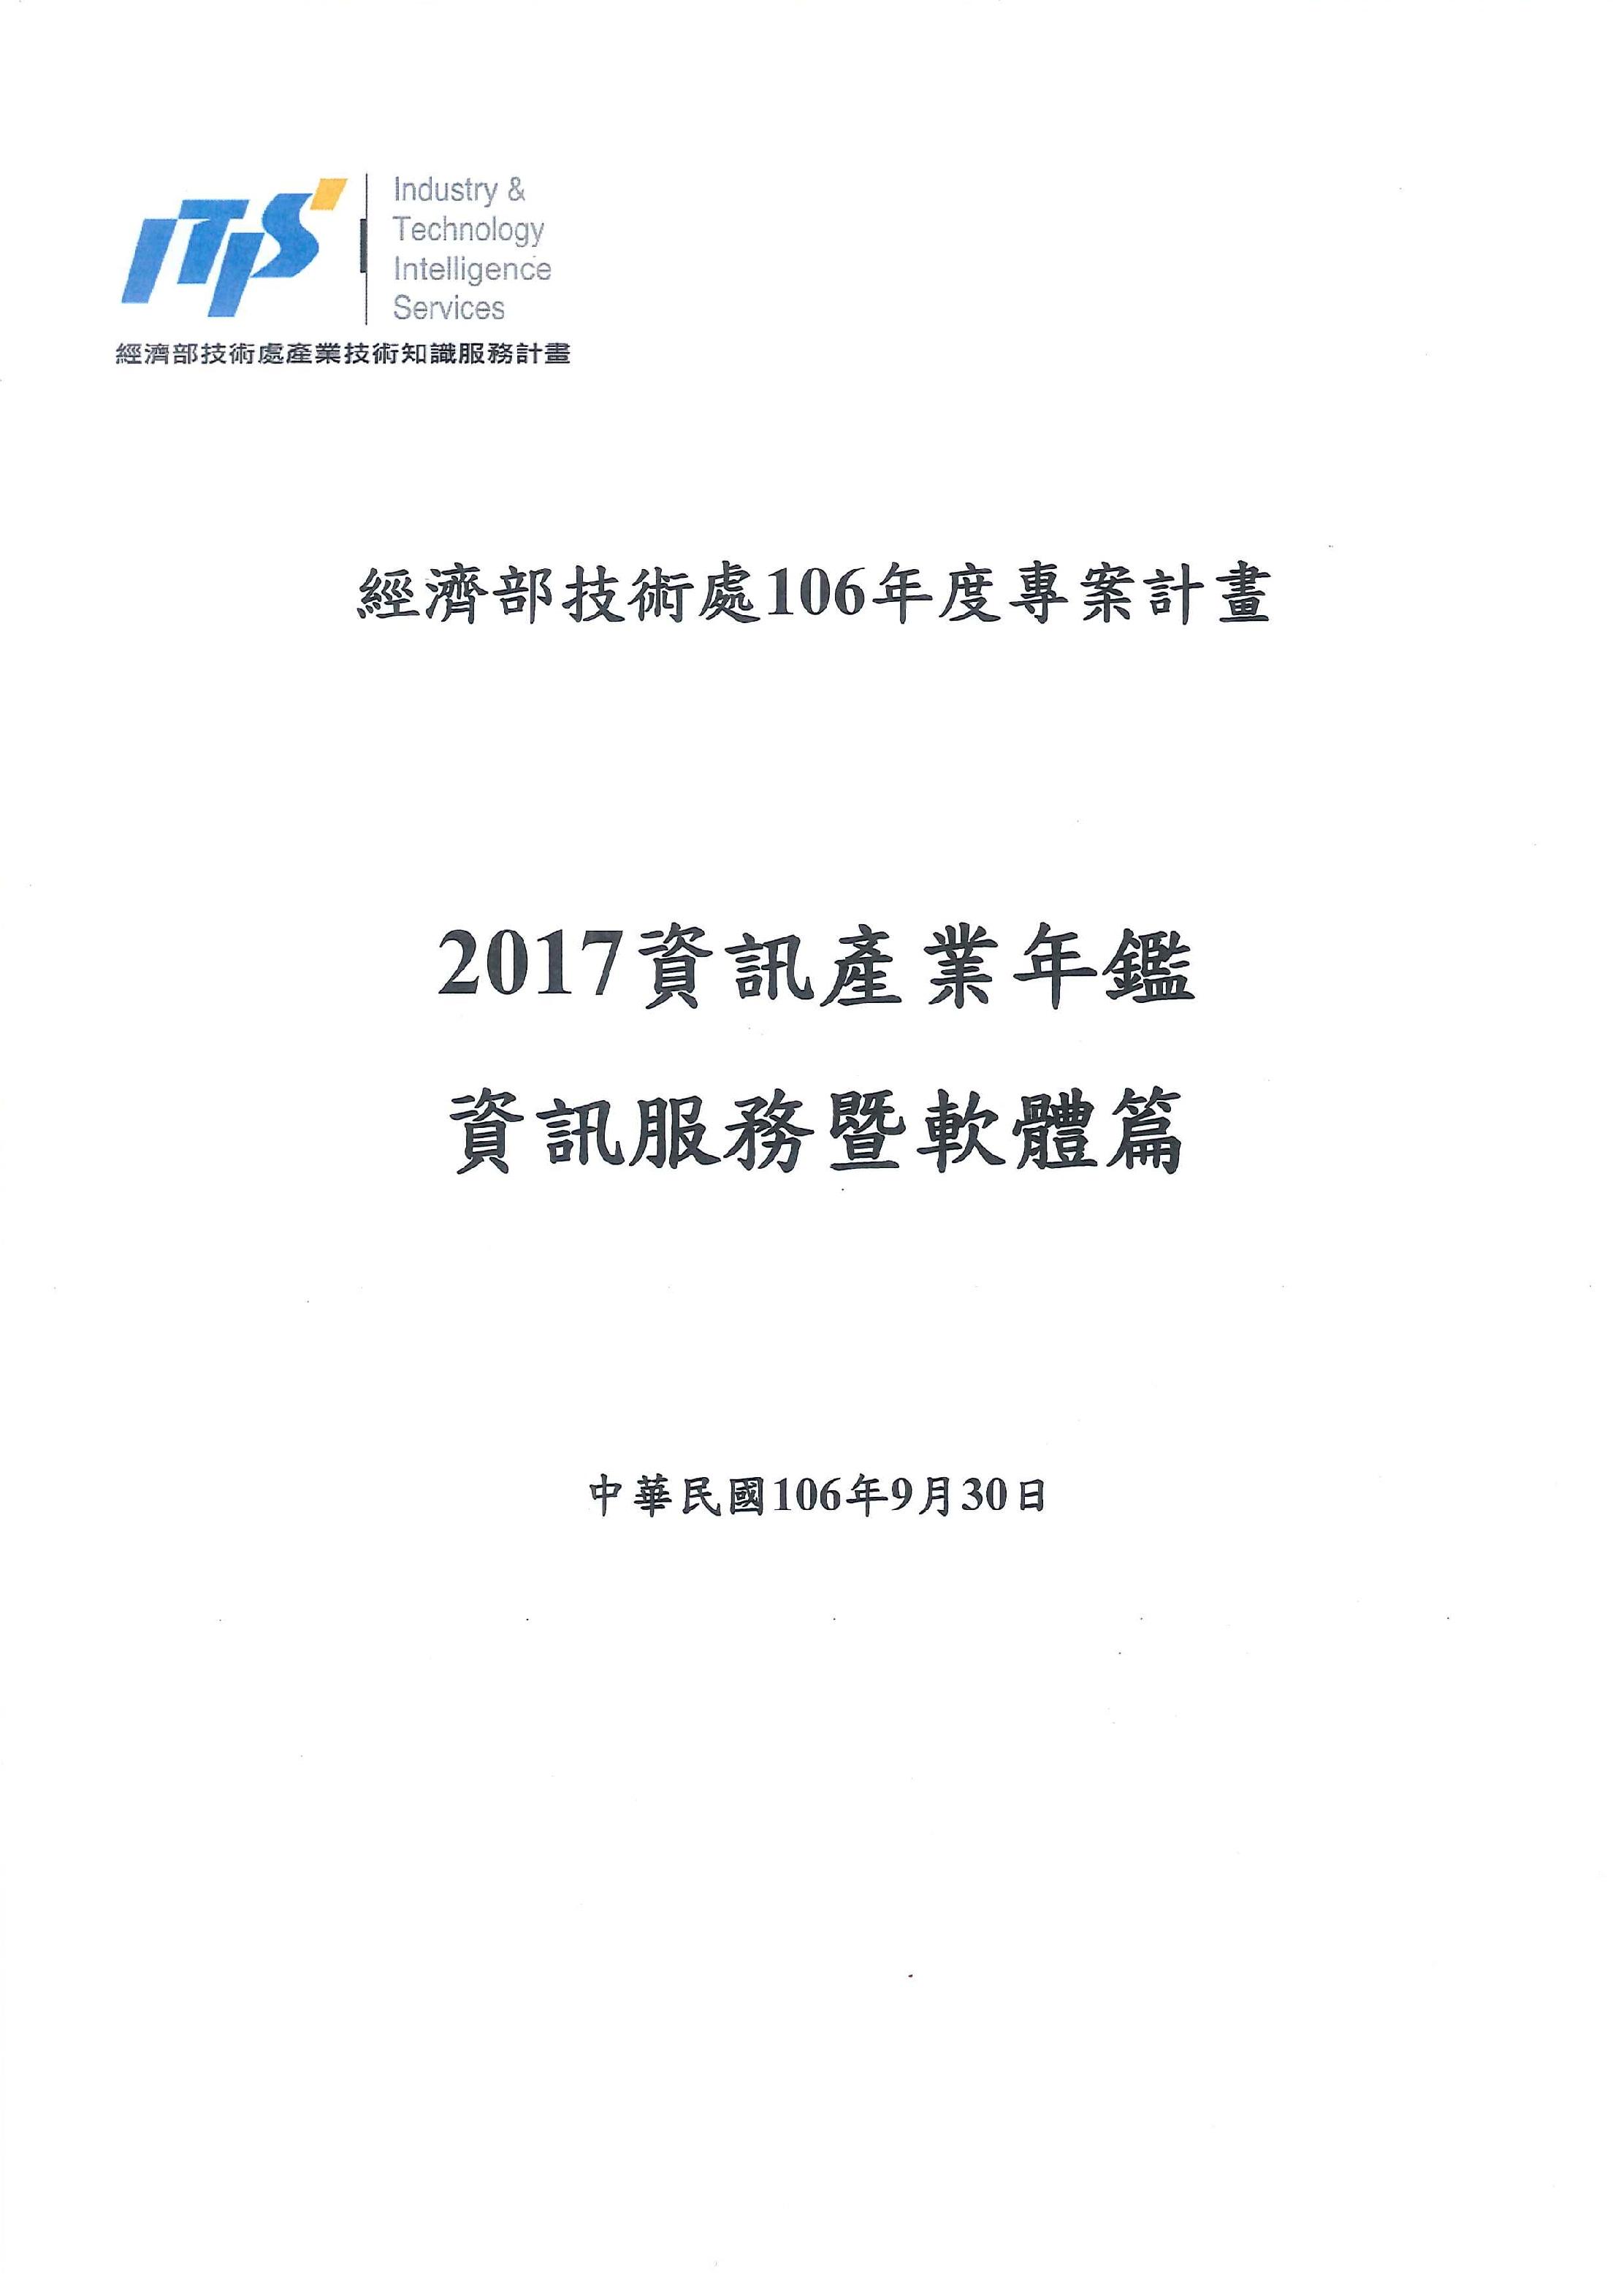 資訊產業年鑑.資訊服務暨軟體篇=IT services industry yearbook